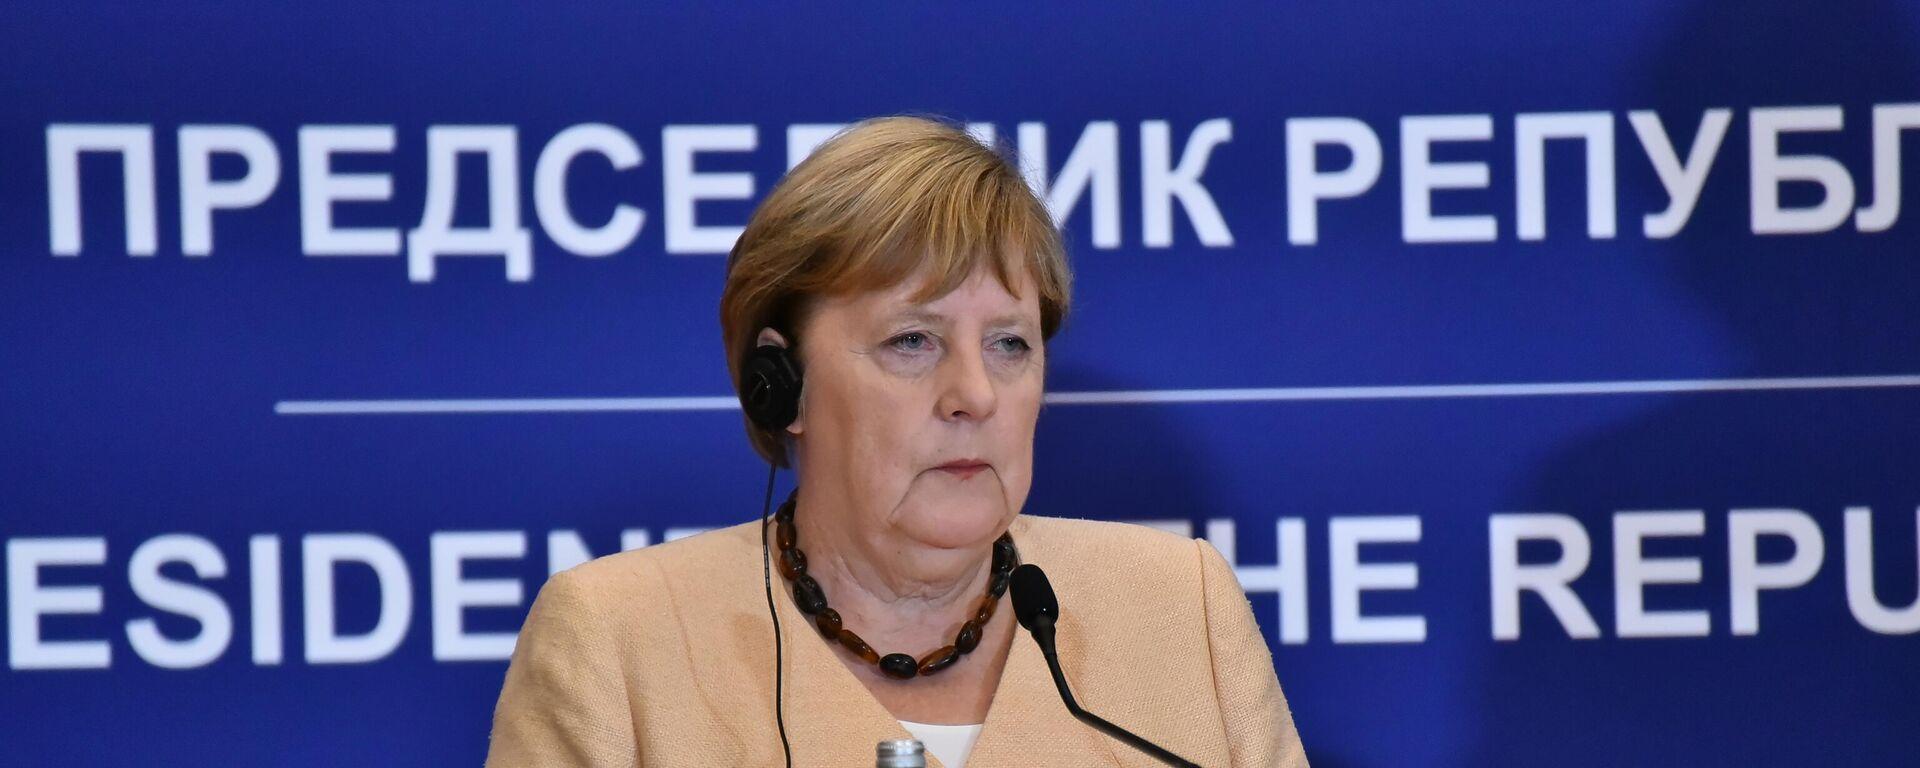 Angela Merkel u Beogradu - Sputnik Srbija, 1920, 16.09.2021